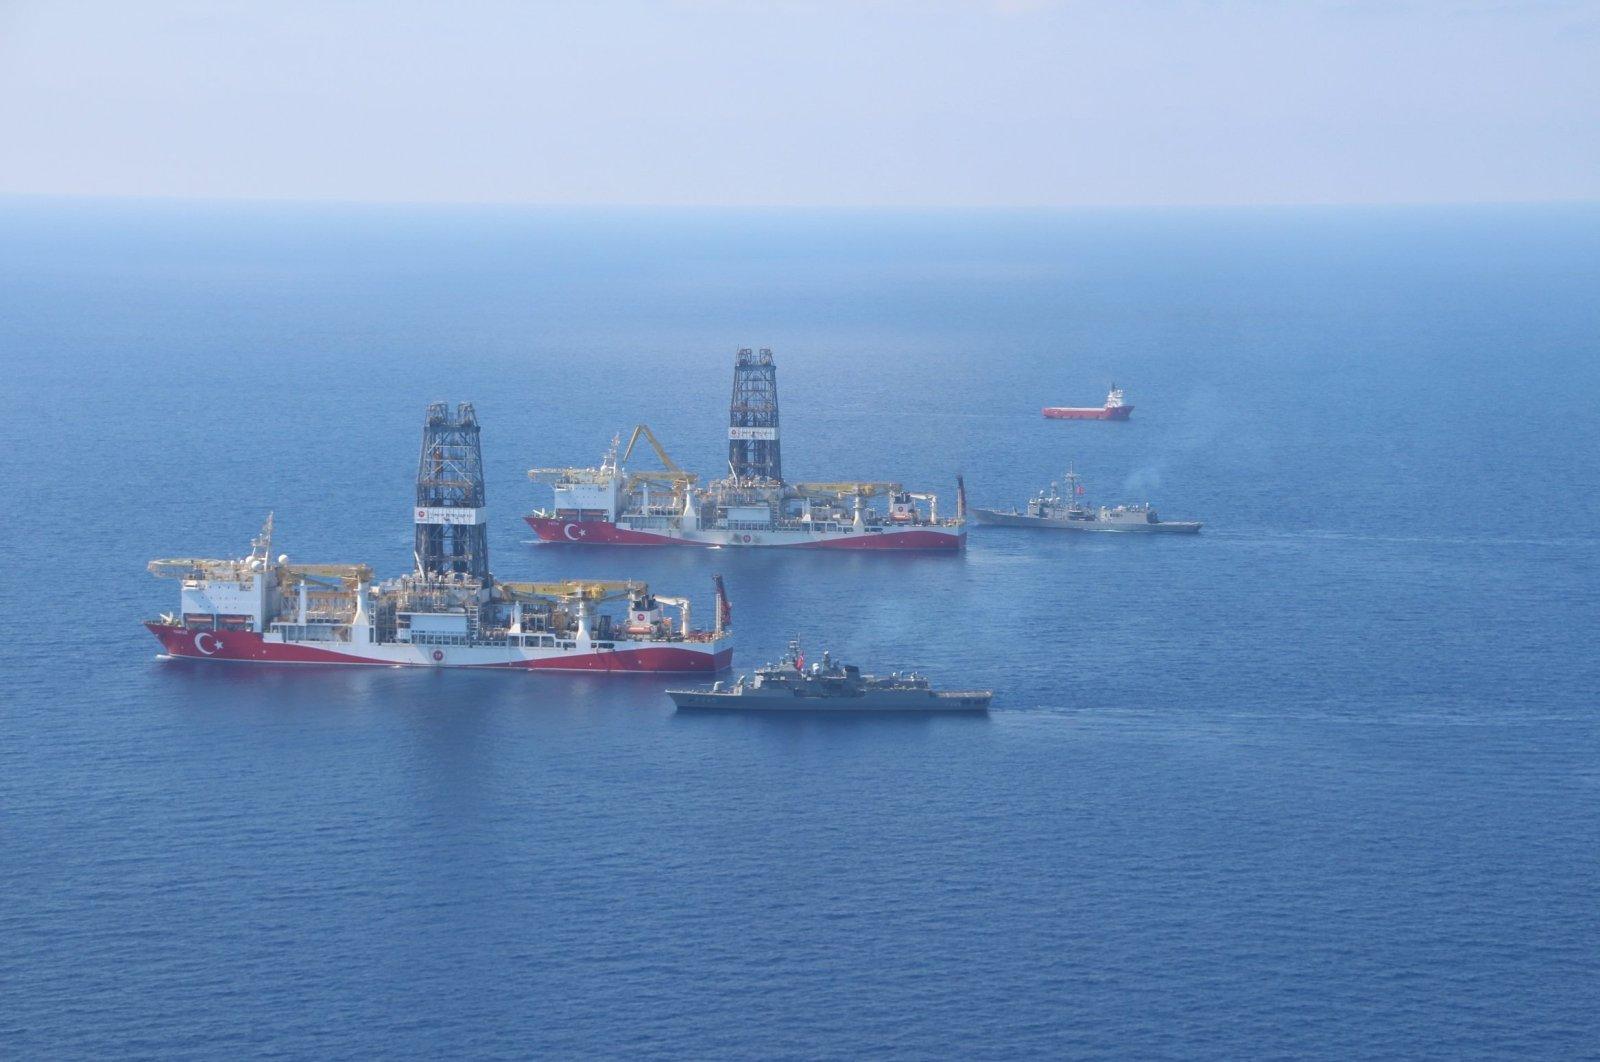 Turkey's drillships Fatih and Yavuz in the Eastern Mediterranean along with Turkish Navy vessels. (IHA File Photo)